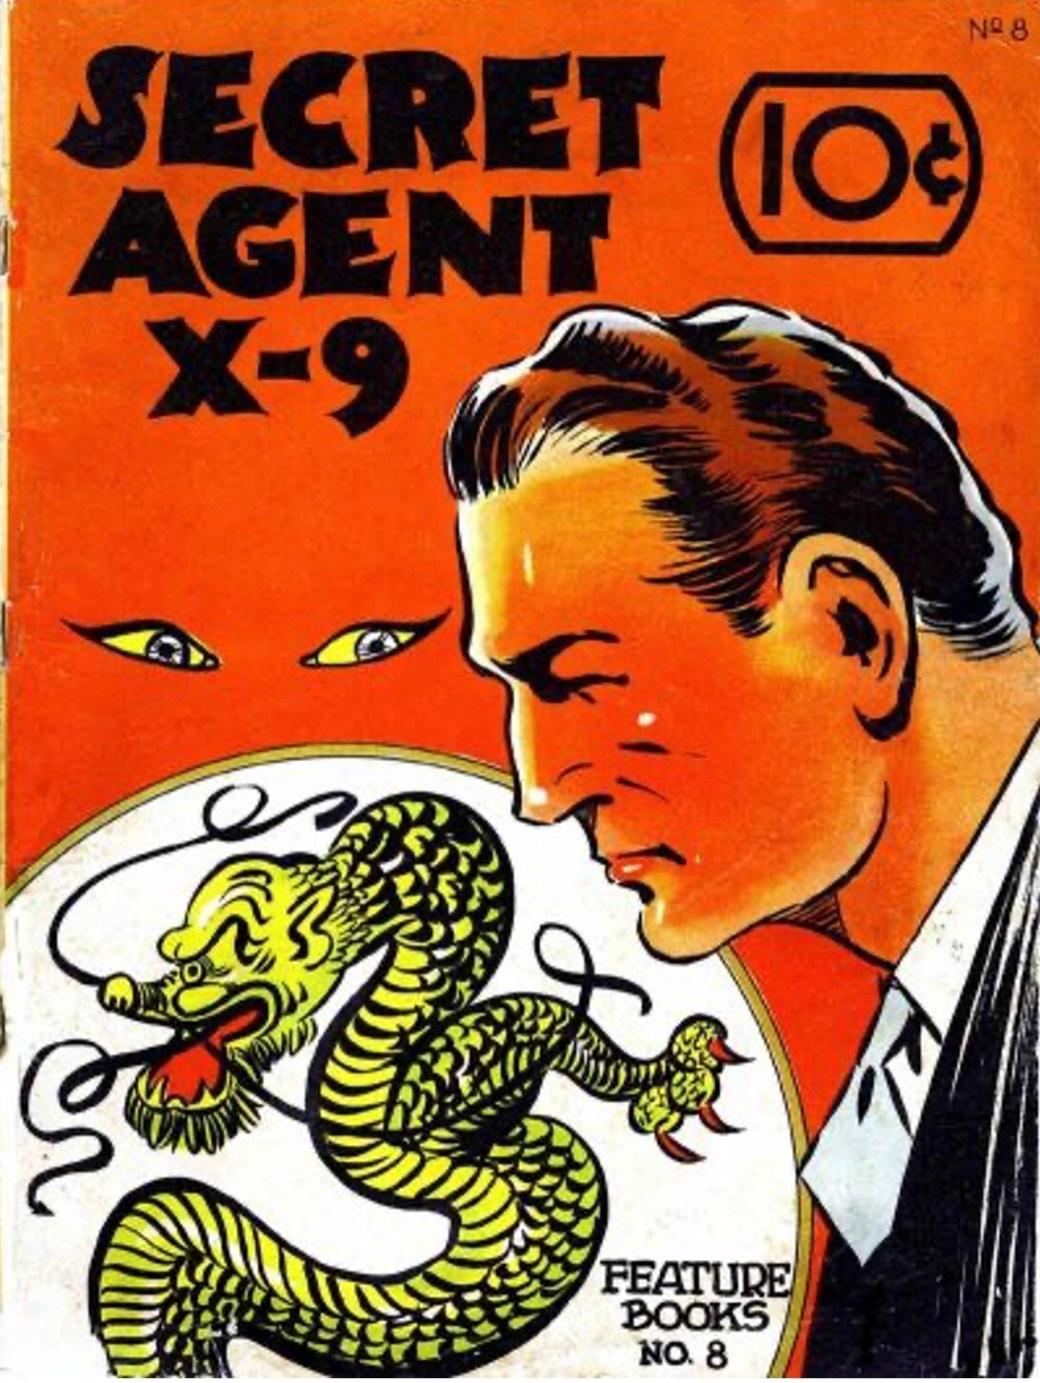 Omslag till Feature Books #8 innehållande Secret Agent X-9. ©McKay